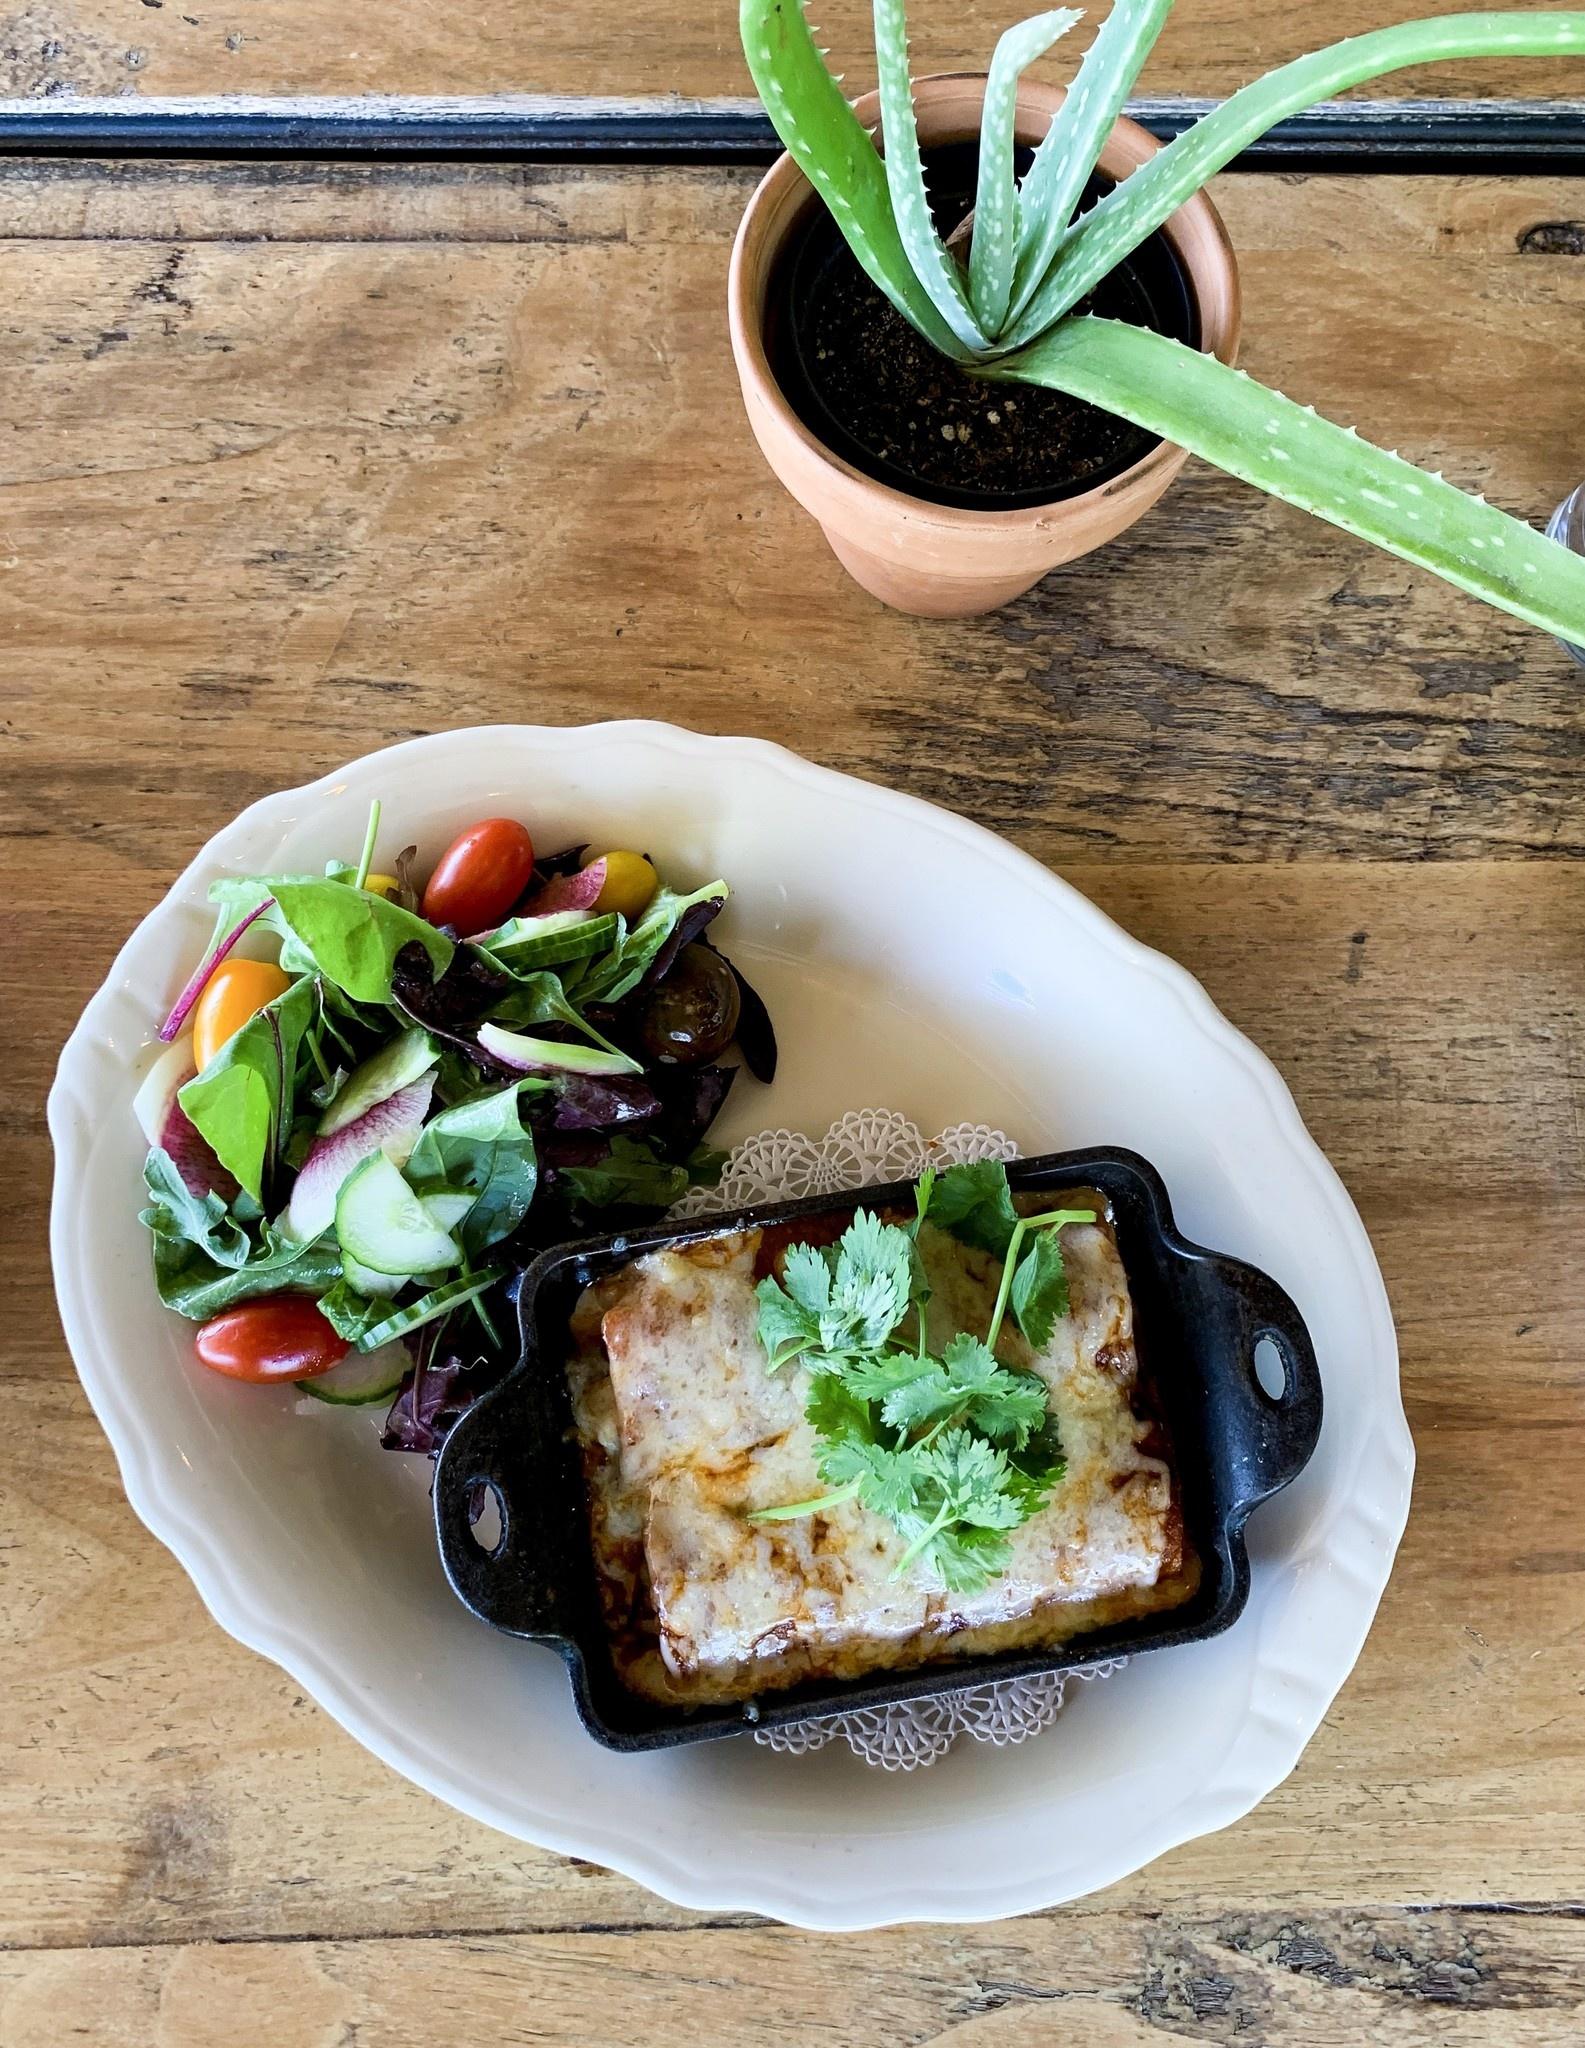 beckett's table phoenix menu veggie enchilada recipe